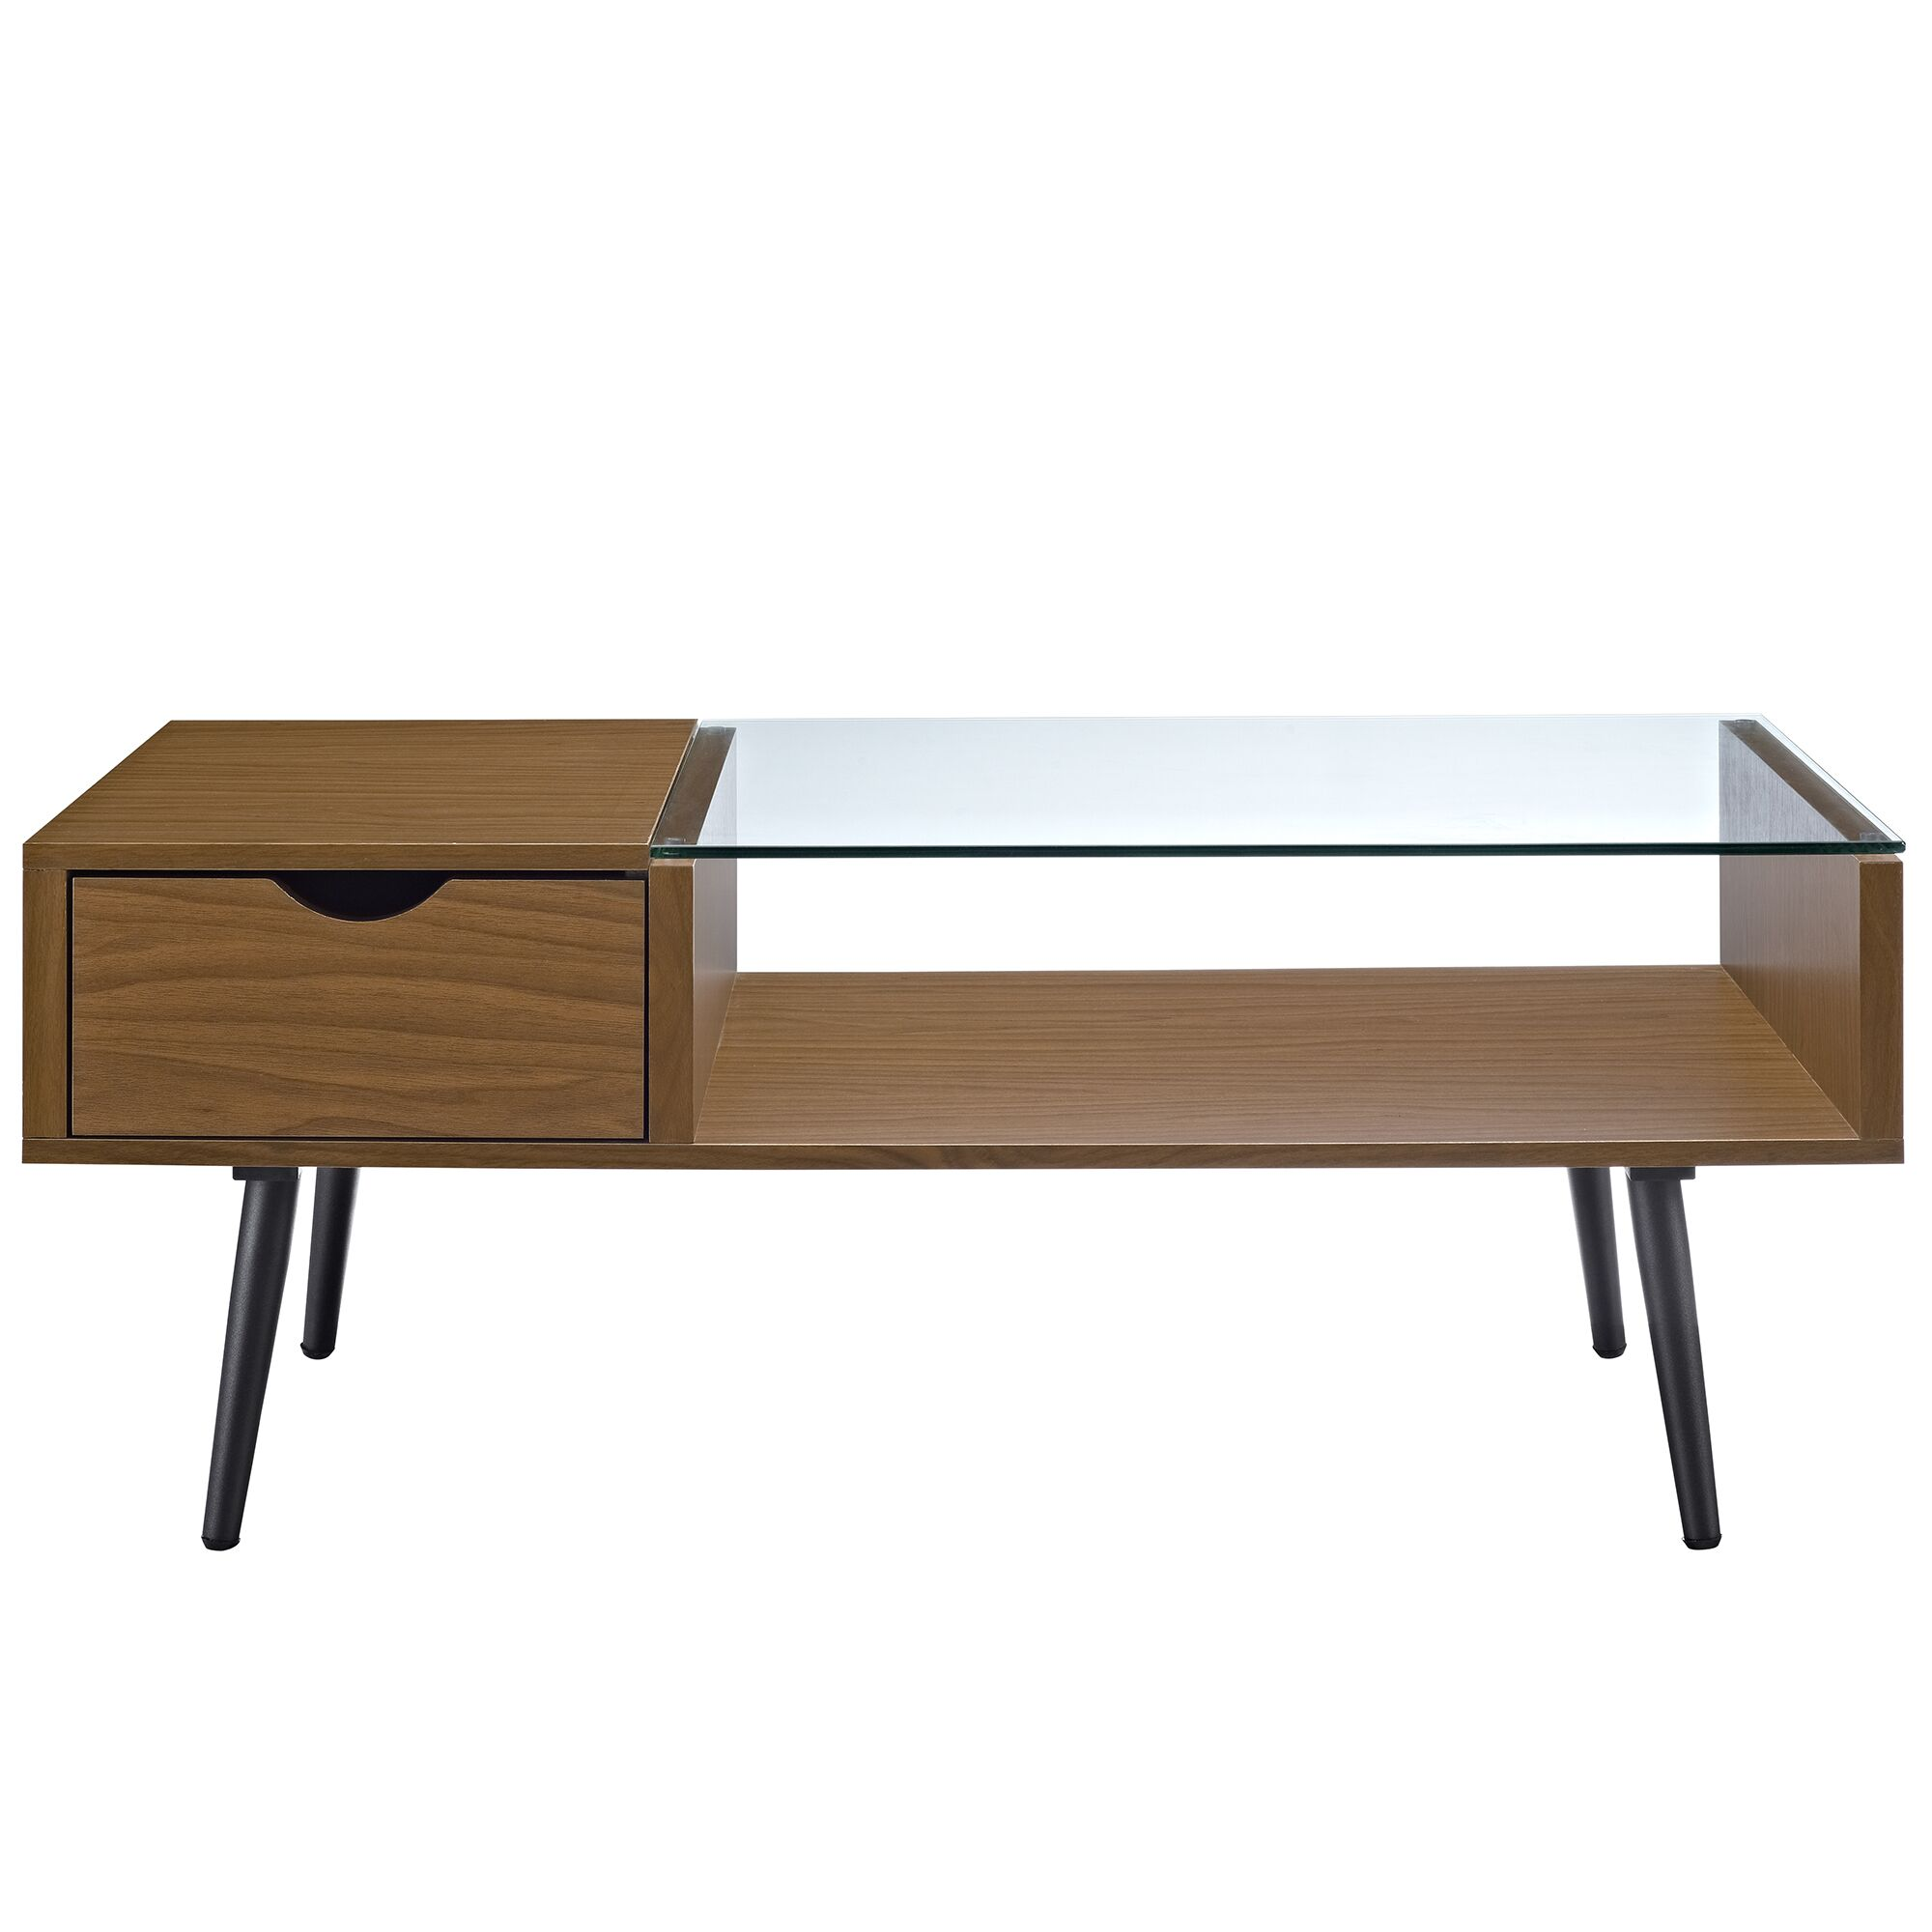 Cirillo Coffee Table Table Base Color: Acorn